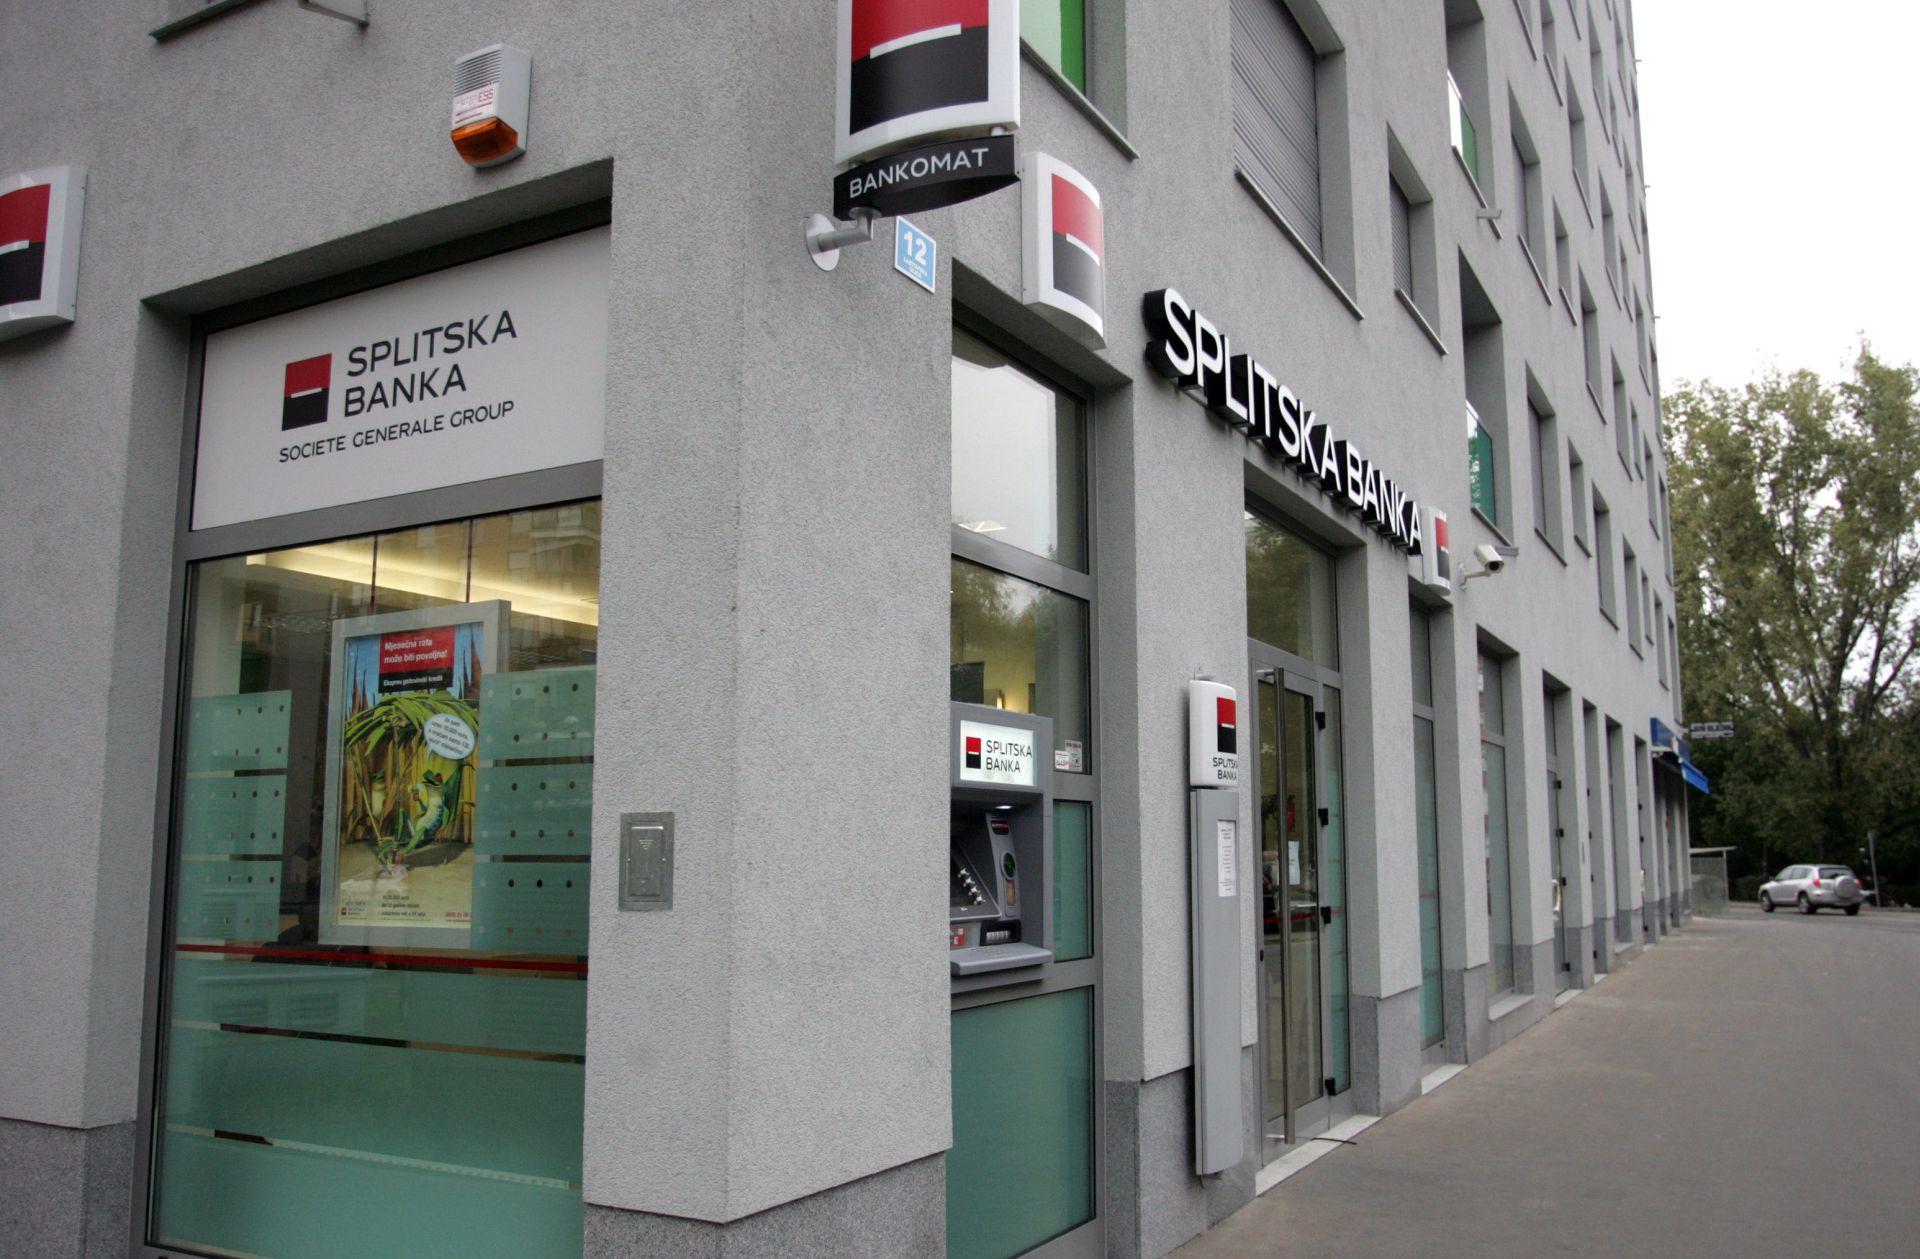 POTPISAN UGOVOR: OTP banka kupuje Splitsku banku